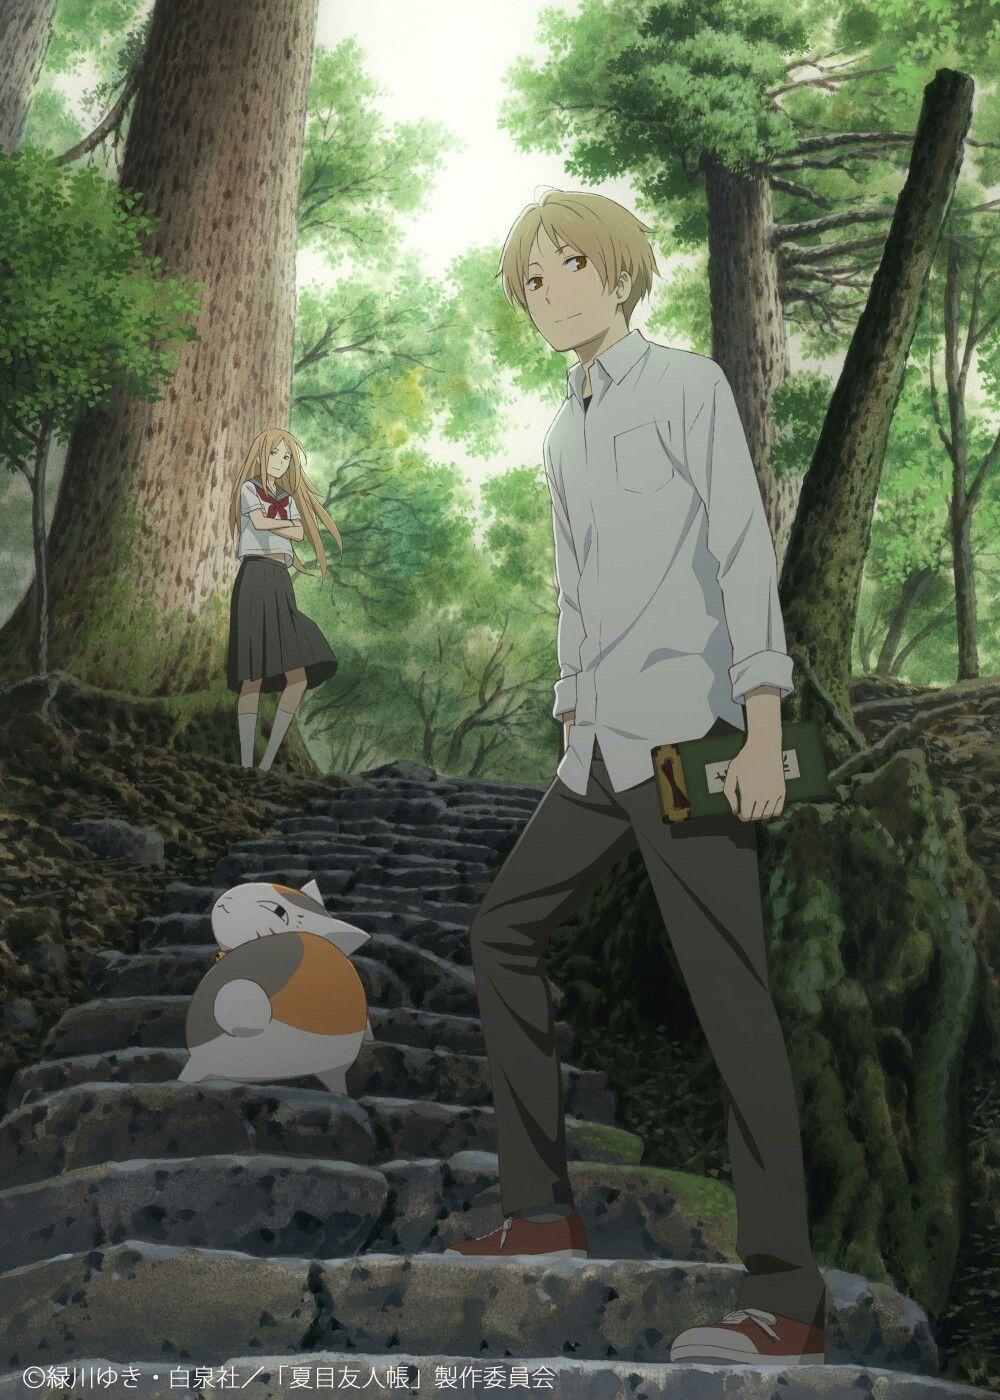 Anime Natsume Yuujinchou Wallpaper My Canvas Friend